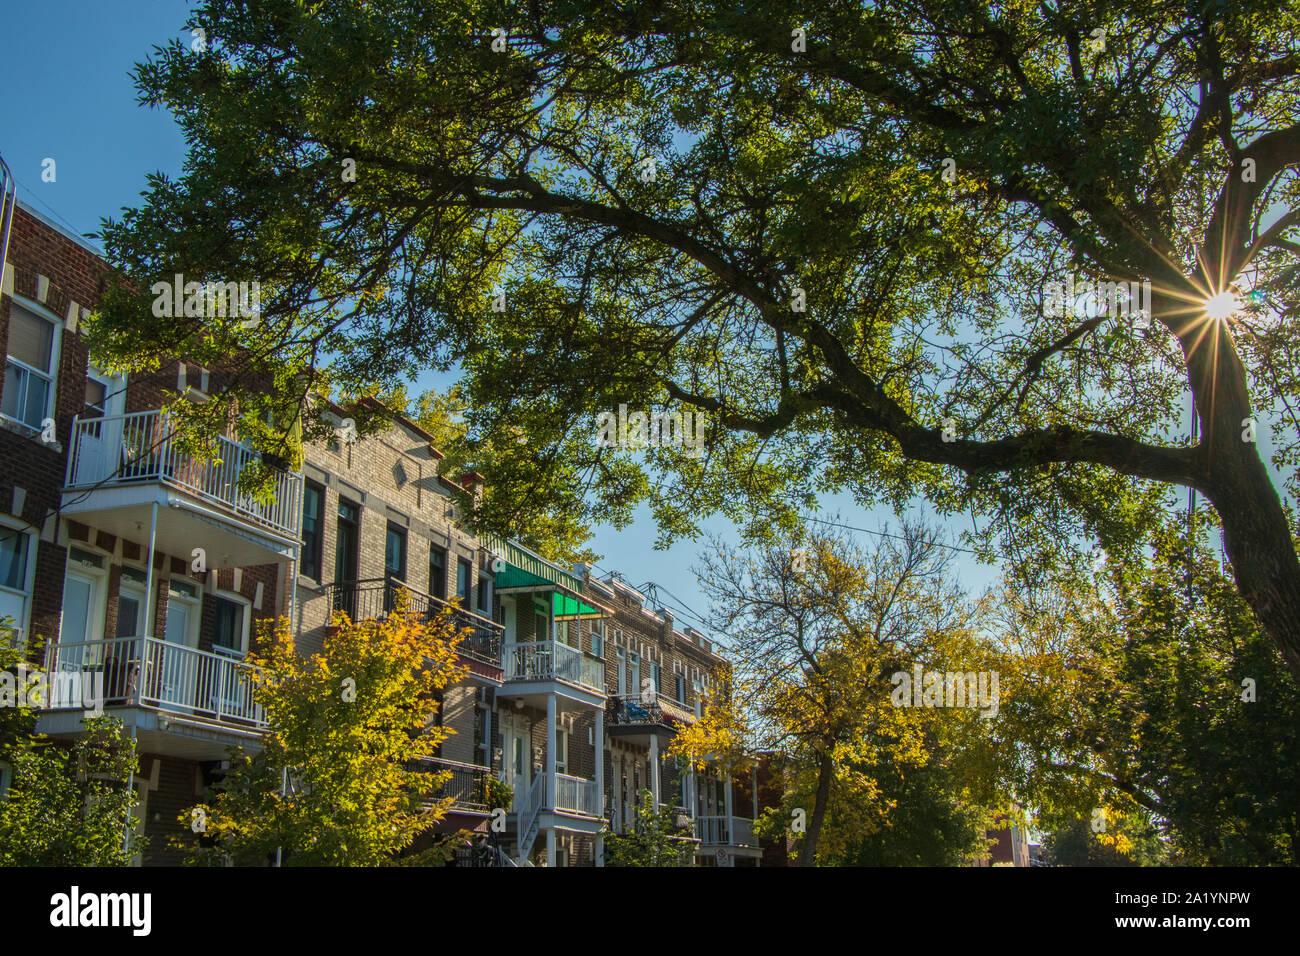 September 29, 2019 - Montréal, Québec, Canada: Montreal housing and a sunburst through a tree by an autumn morning Stock Photo